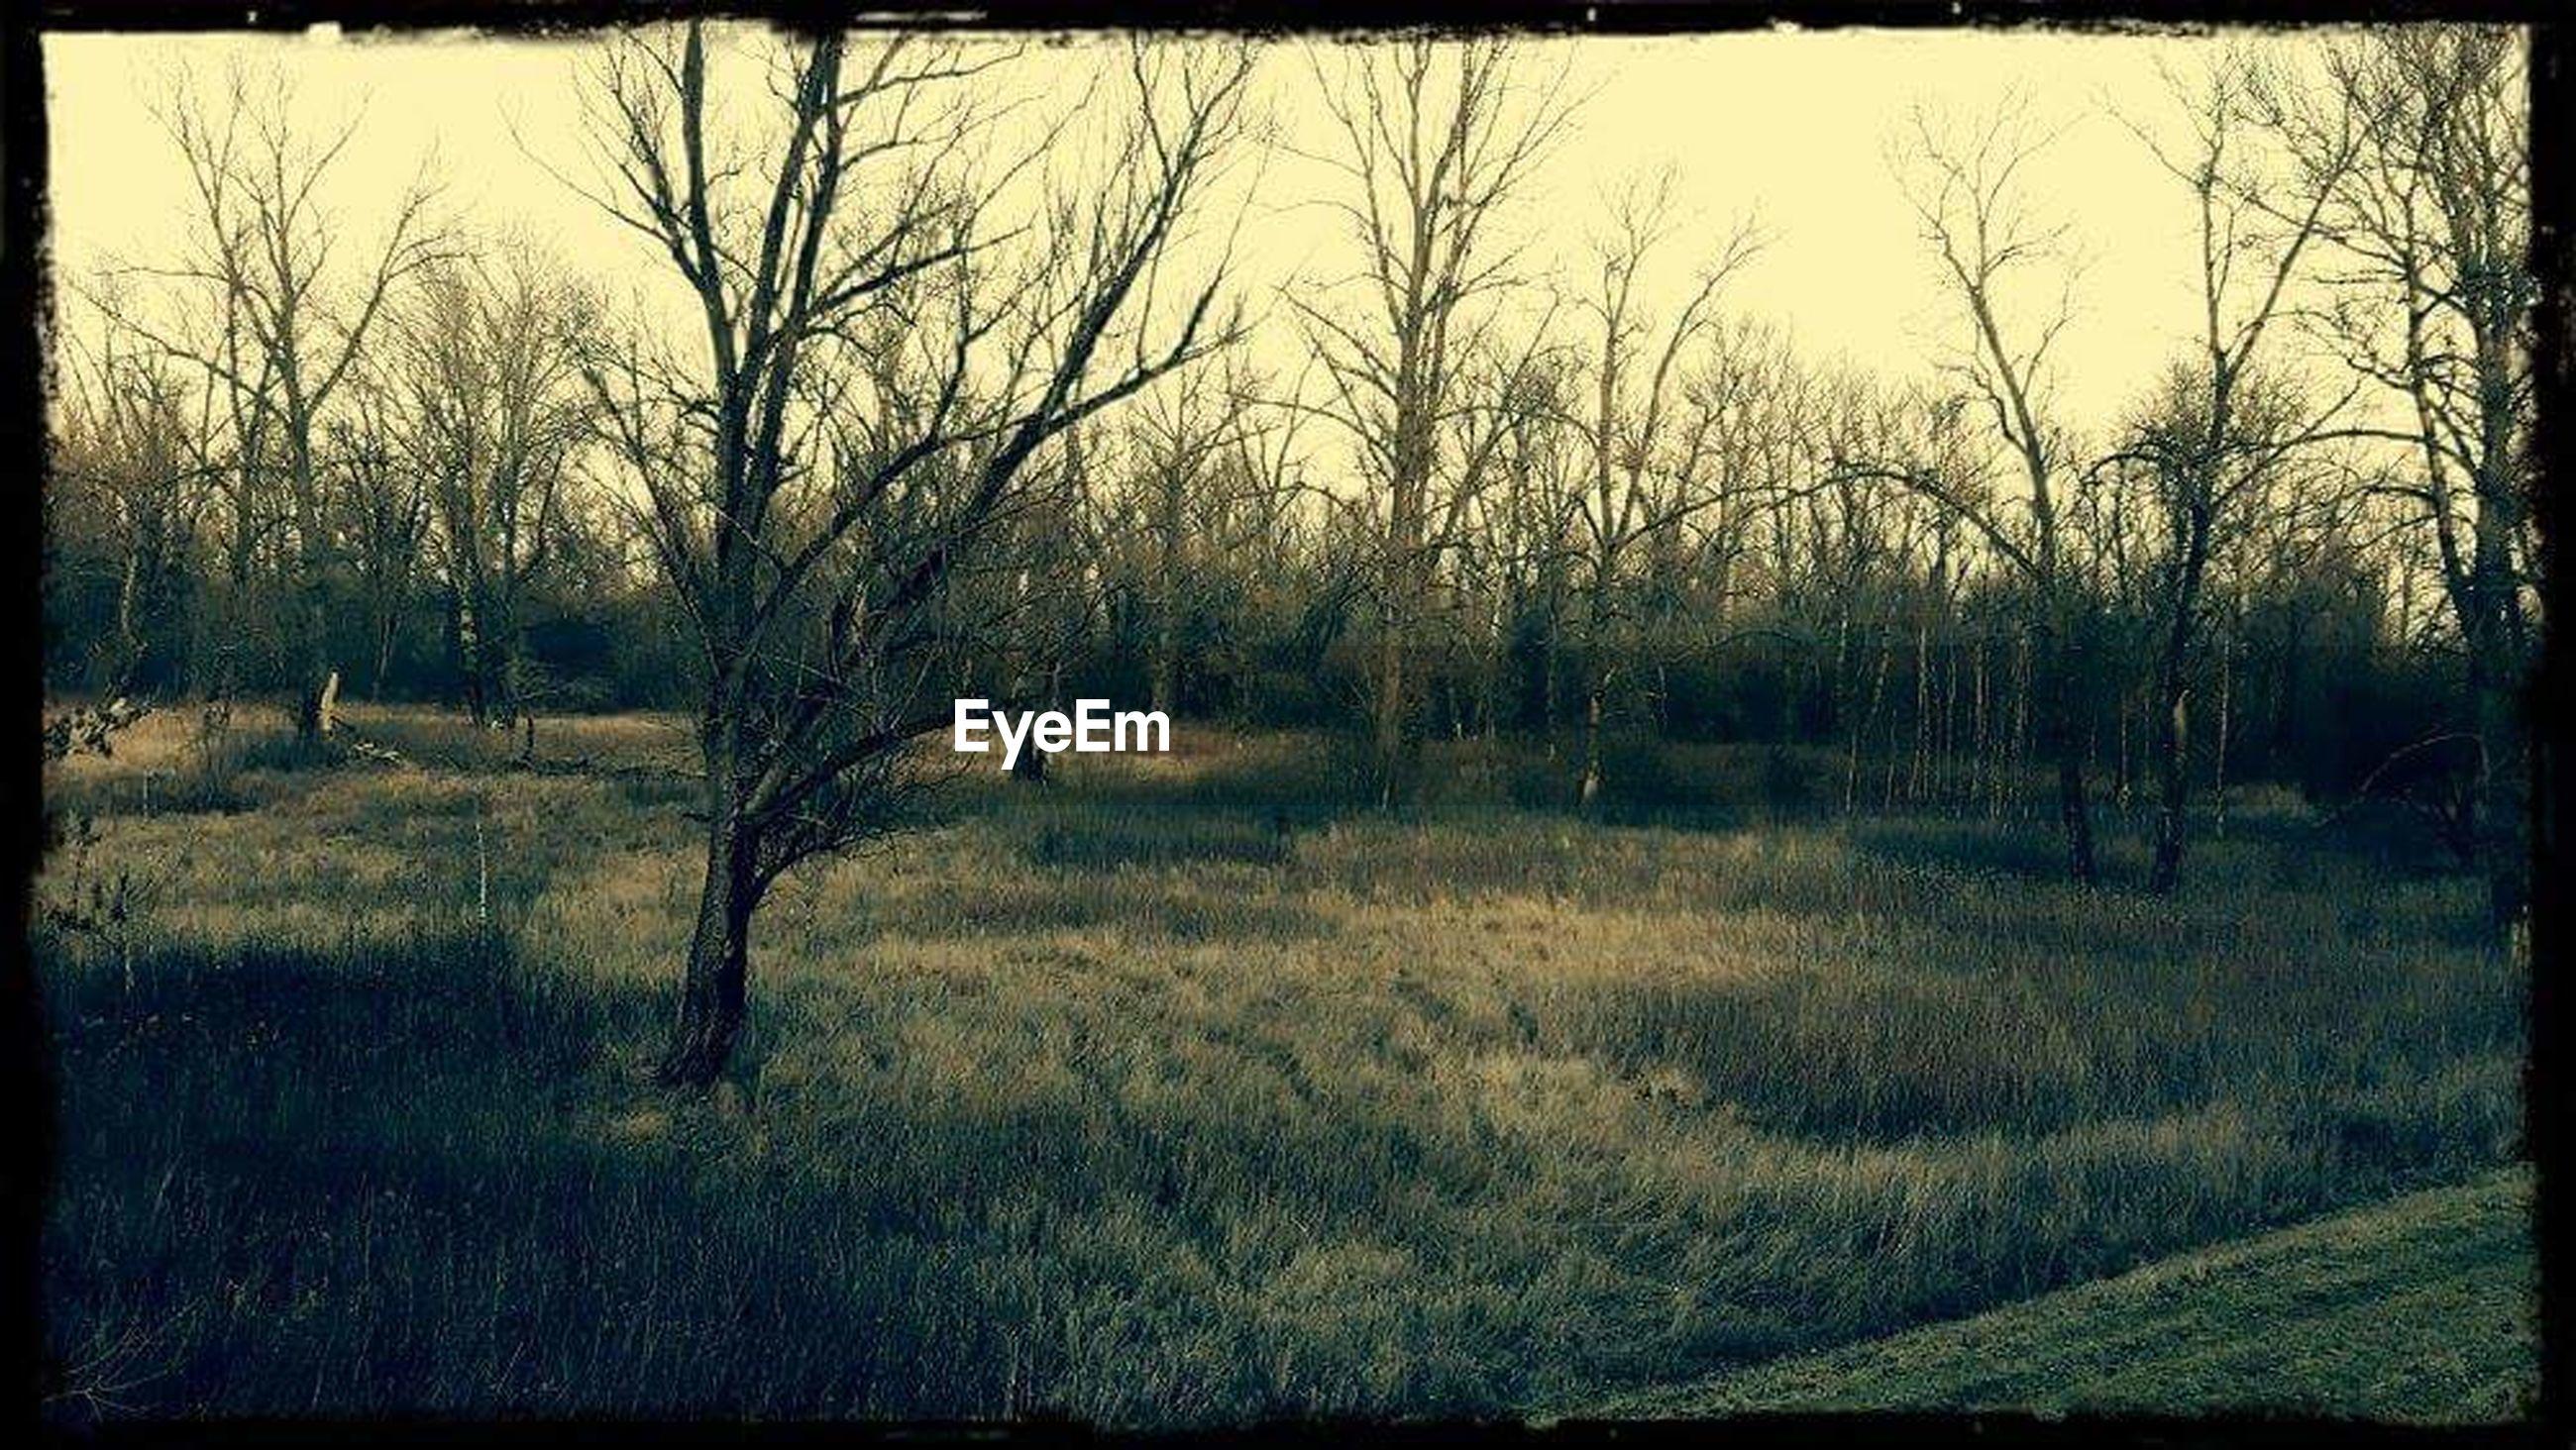 tree, bare tree, grass, tranquility, tranquil scene, field, landscape, scenics, nature, beauty in nature, growth, grassy, non-urban scene, sky, no people, outdoors, non urban scene, tree trunk, day, remote, idyllic, rural scene, vignette